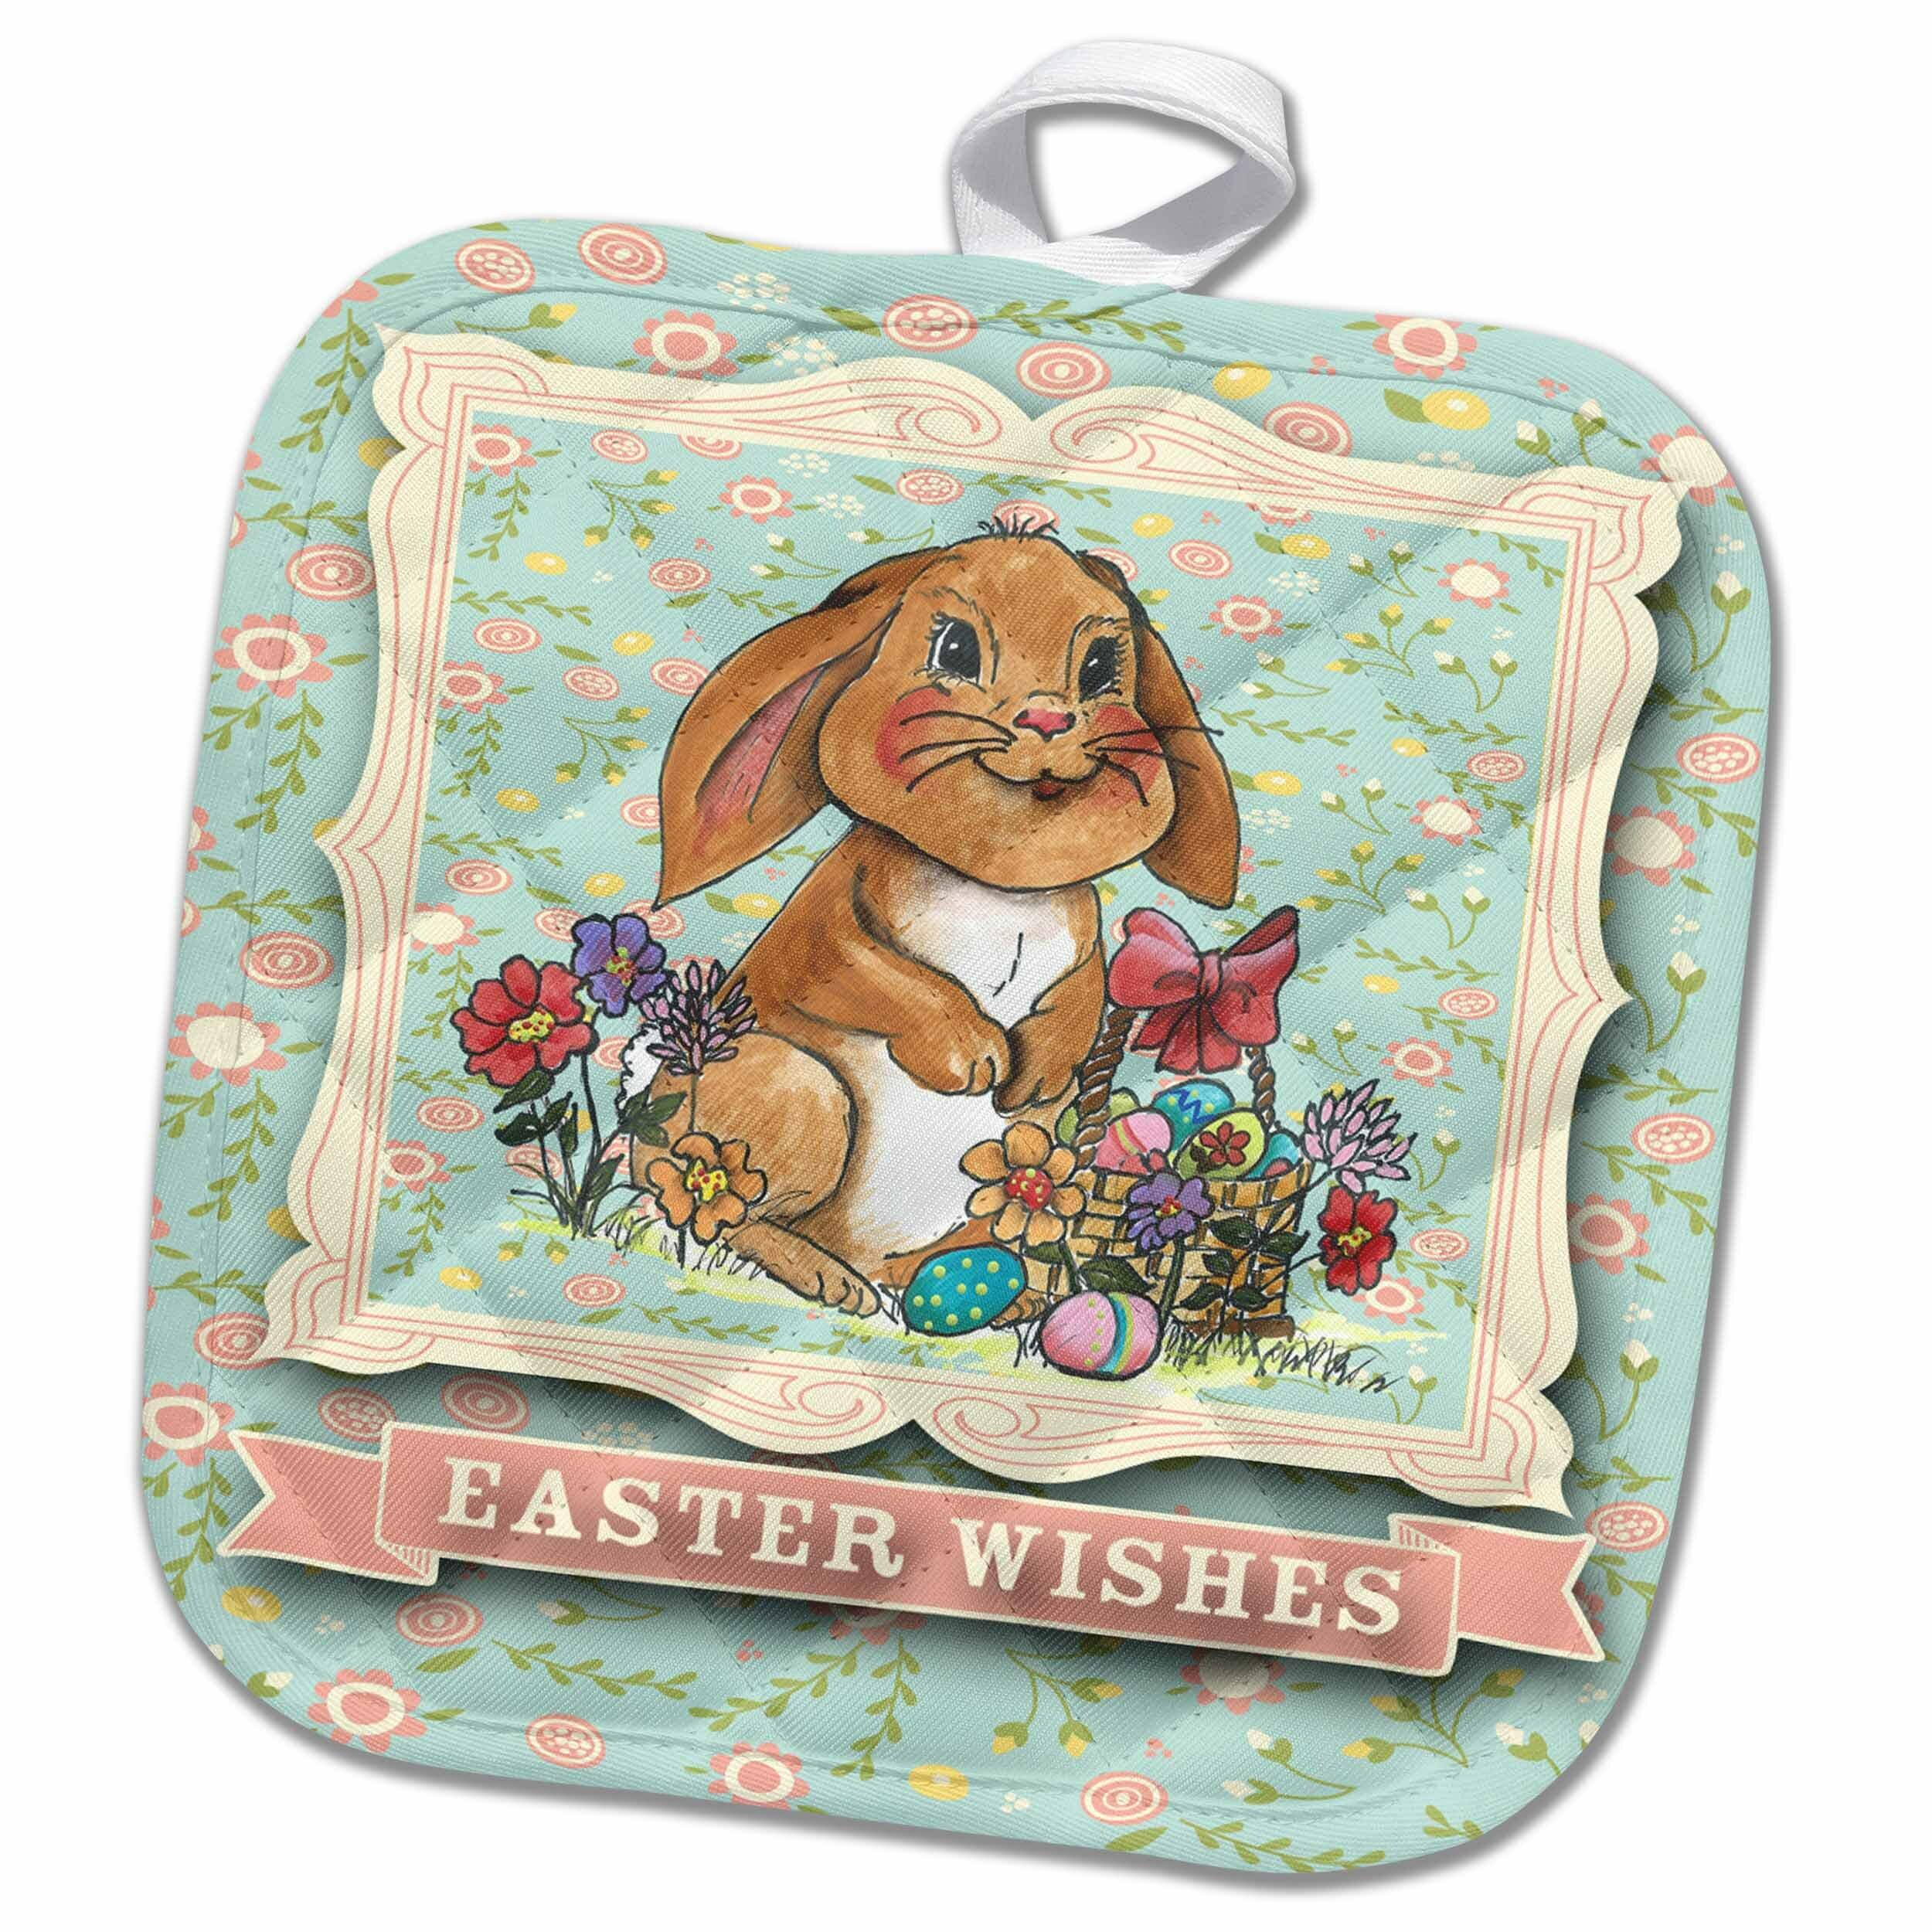 3drose Easter Bunny Wishes Potholder Wayfair